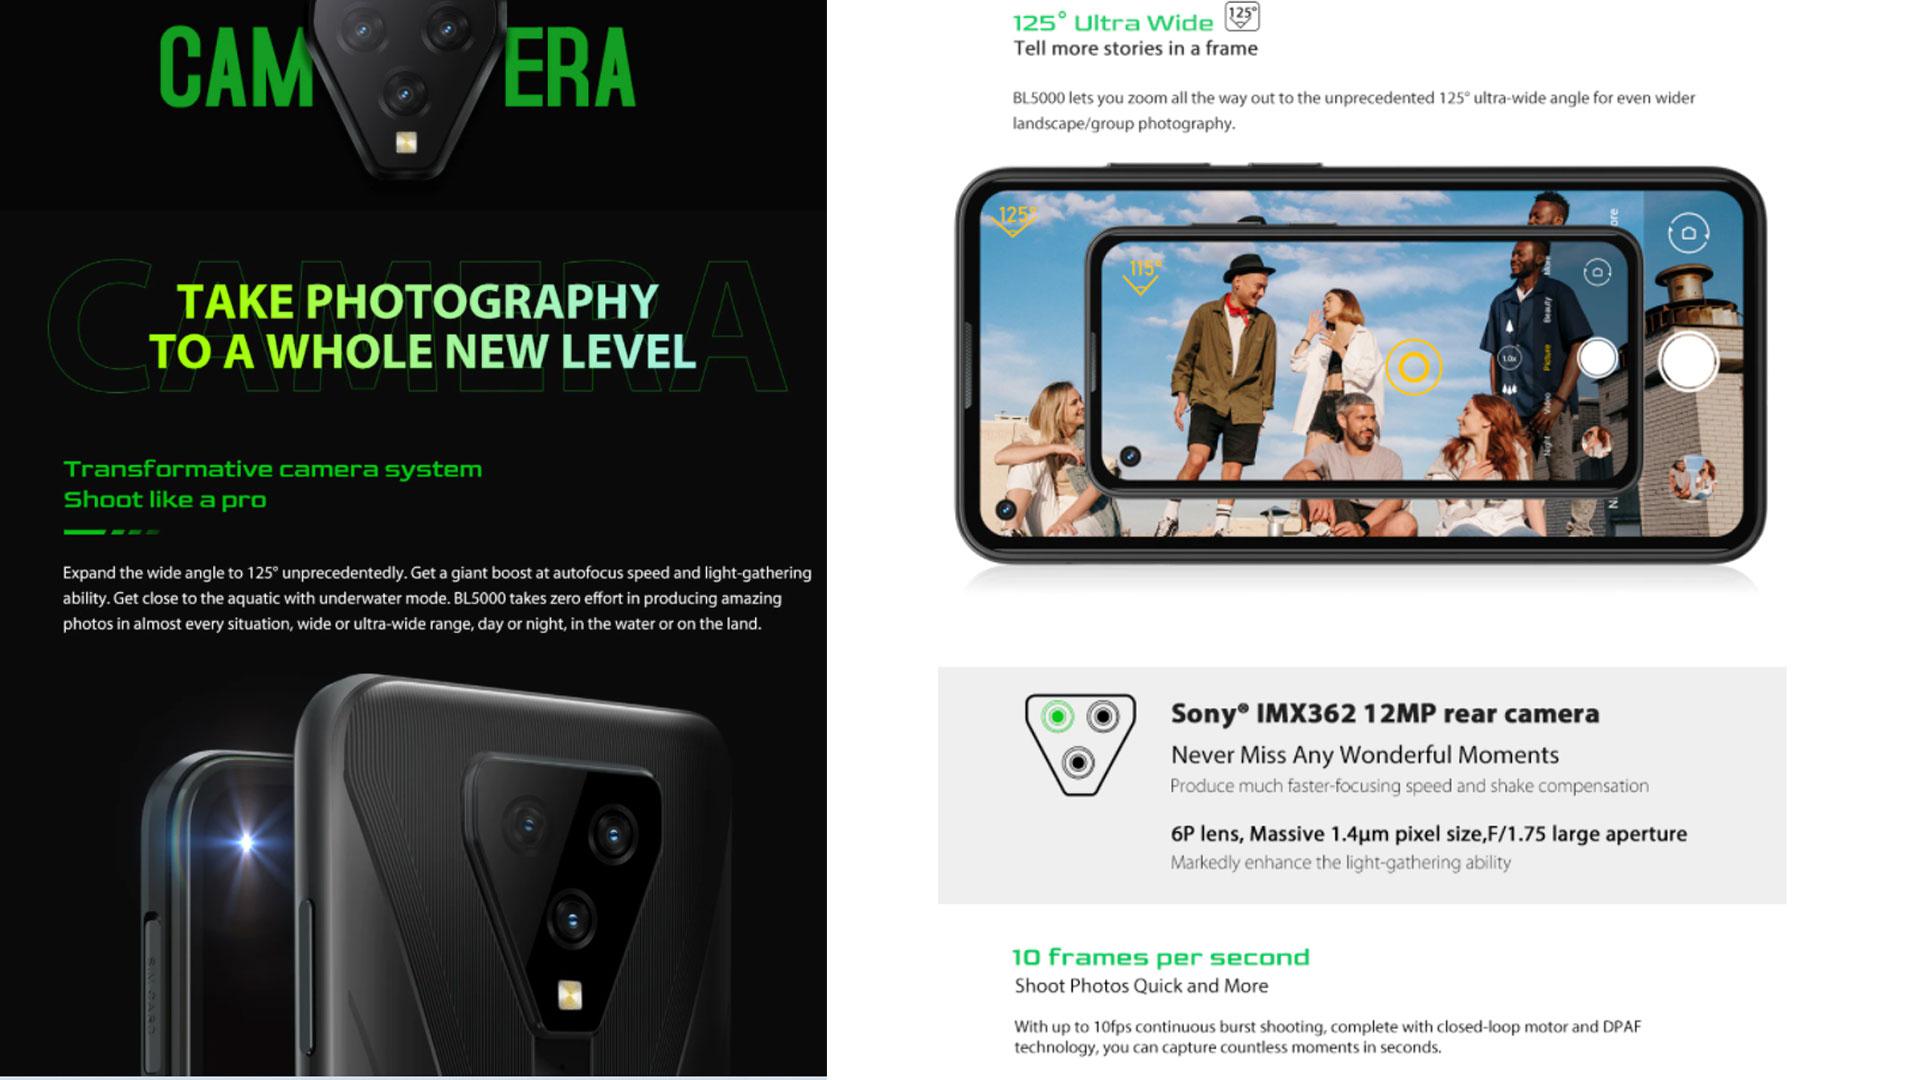 Blackview BL5000 5G Blackview phone Blackview phones Blackview cell phone rugged phone rugged smartphone